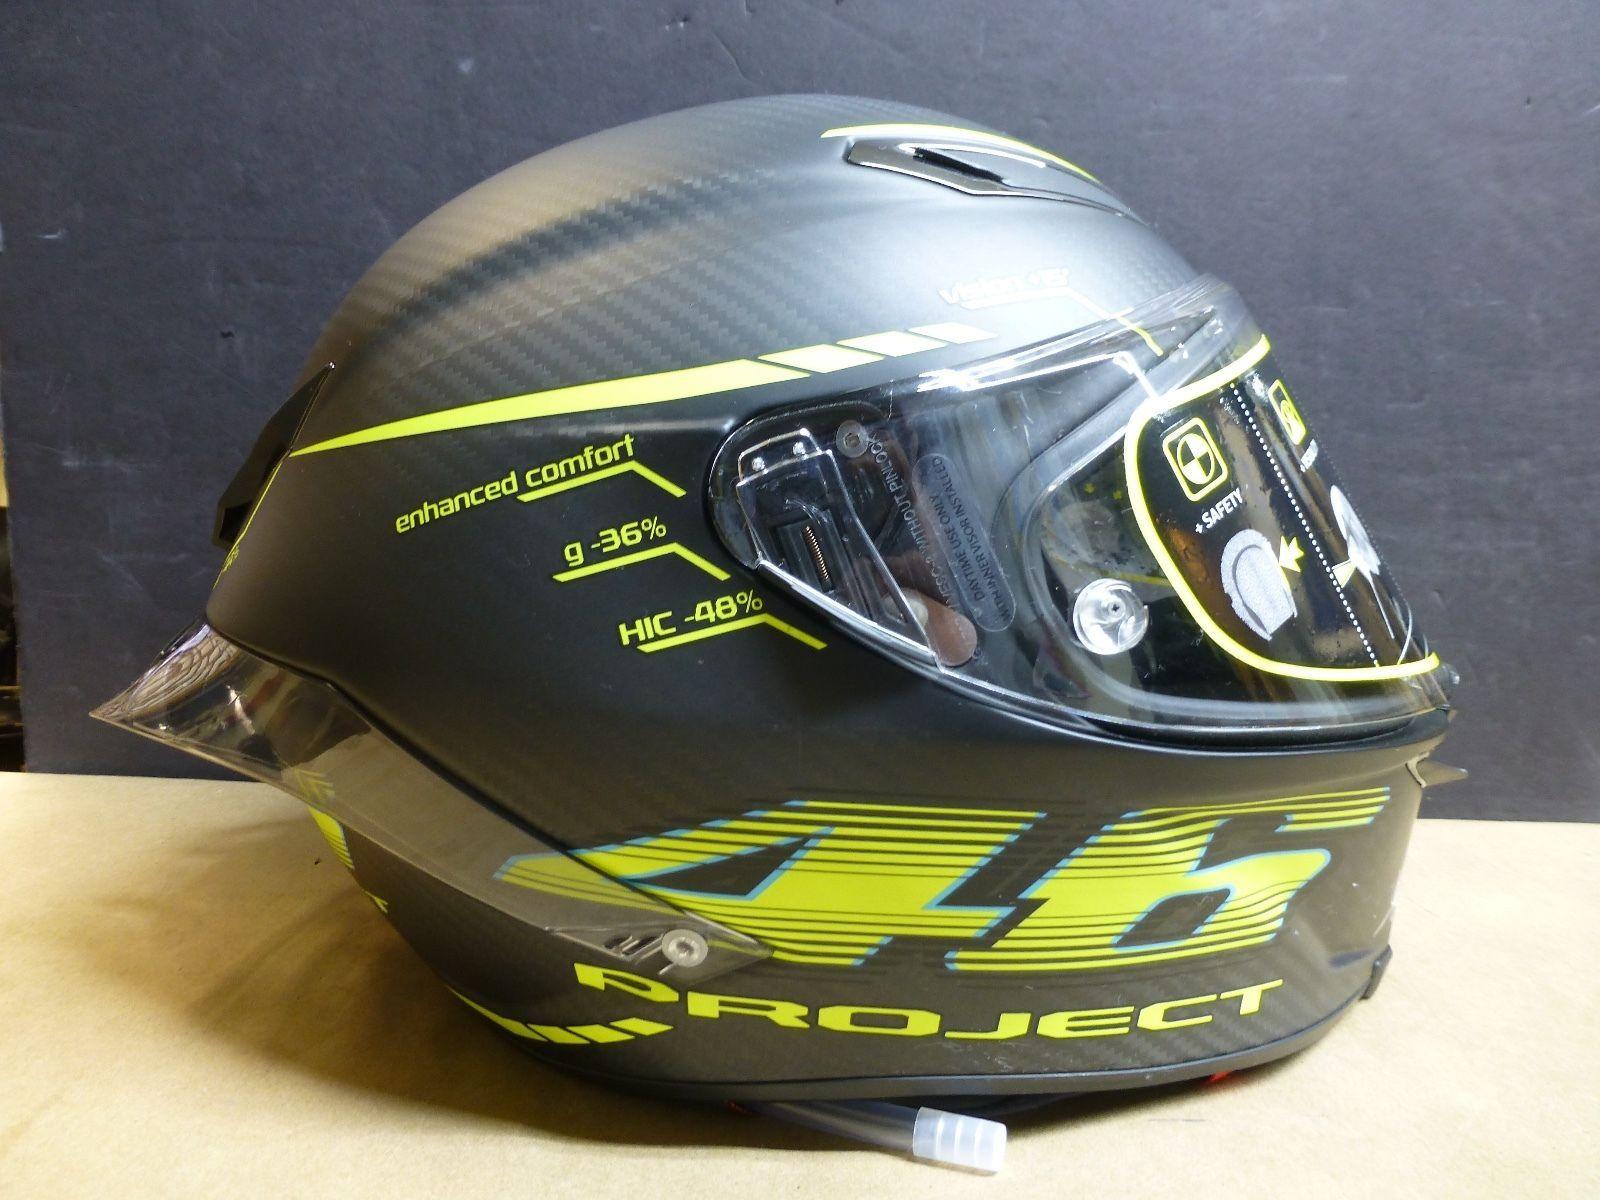 AGV Pista GP Valentino Rossi Project 46 helmet